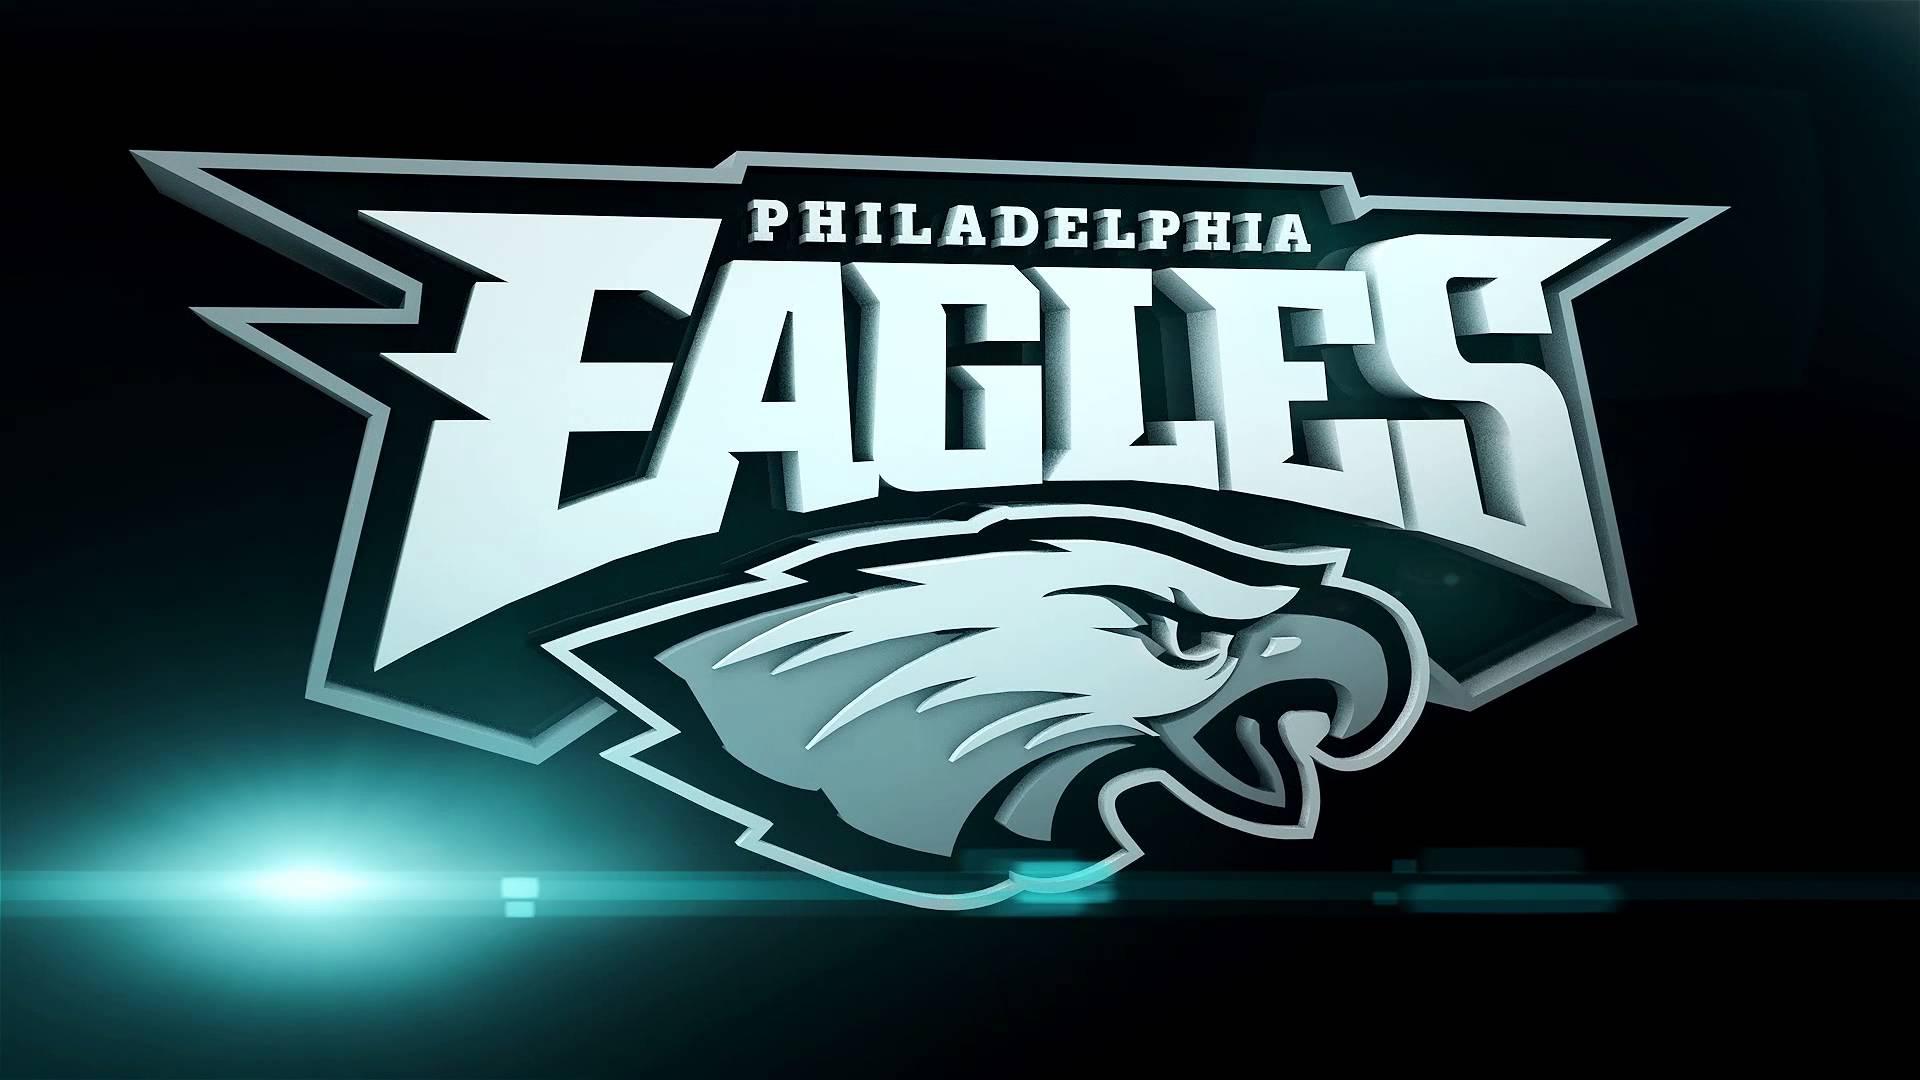 Philadelphia eagles clipart free download clipart download Free Philadelphia Eagles Logo, Download Free Clip Art, Free ... clipart download